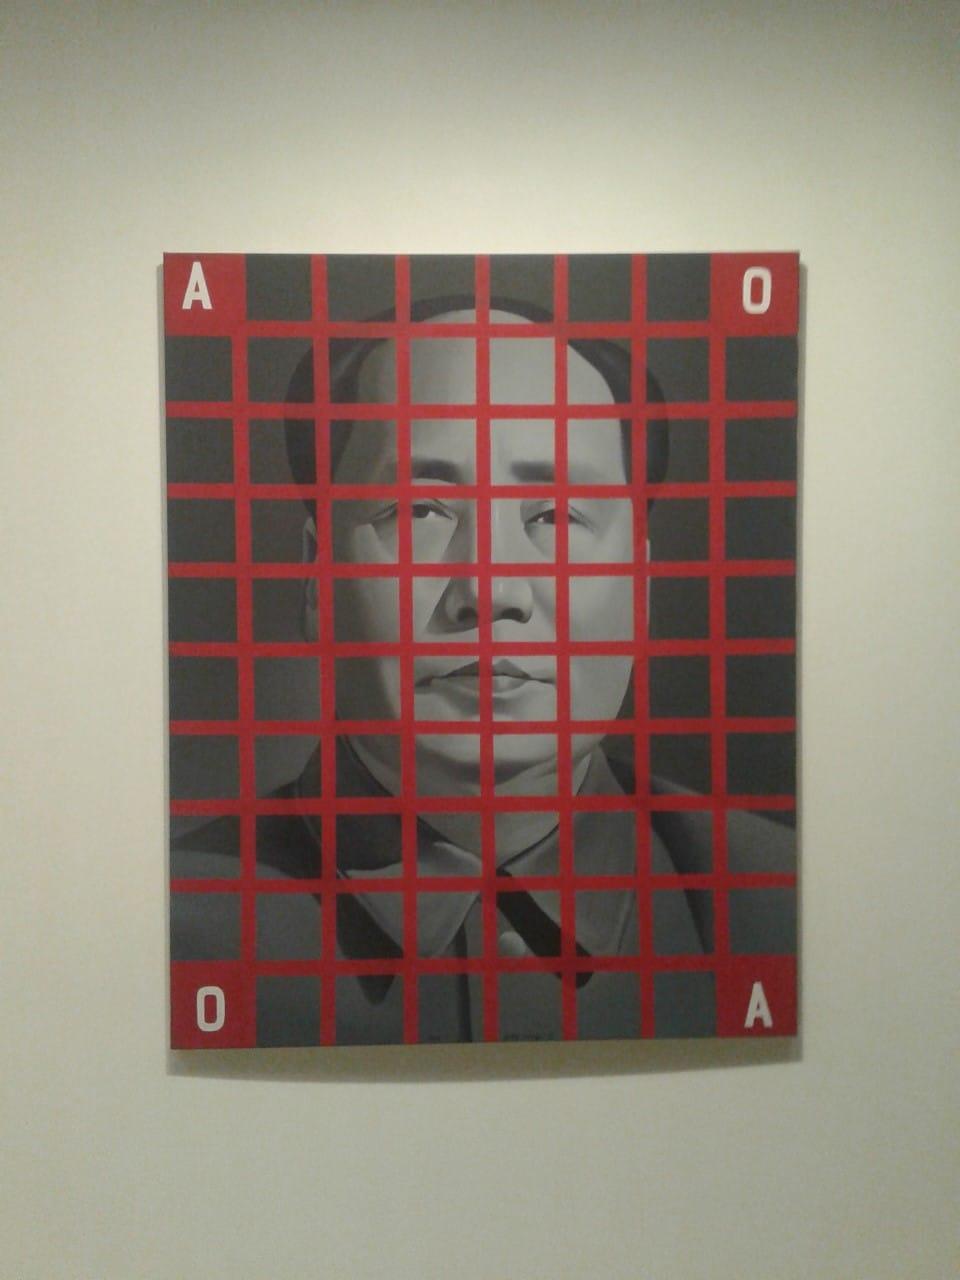 Art & China after 1989: coda